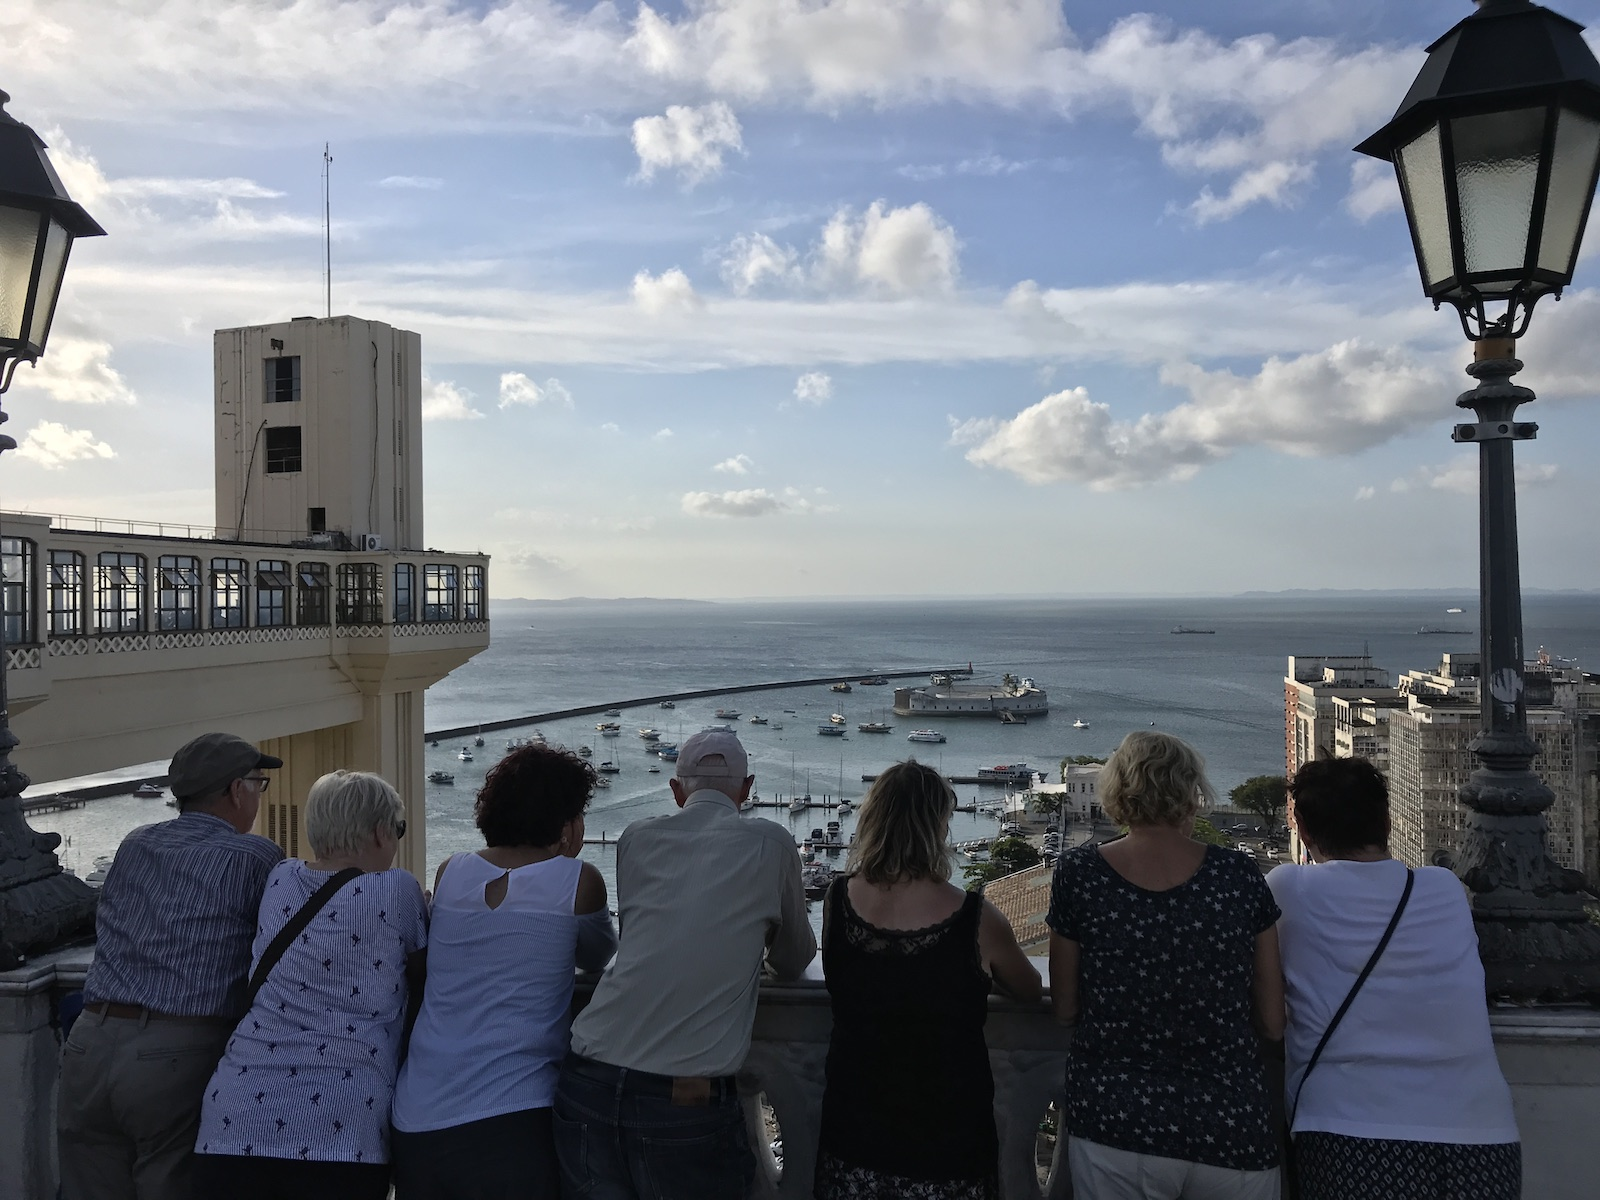 tourameo-reiseveranstalter-gruppenreise-brasilien-salvador-gruppe